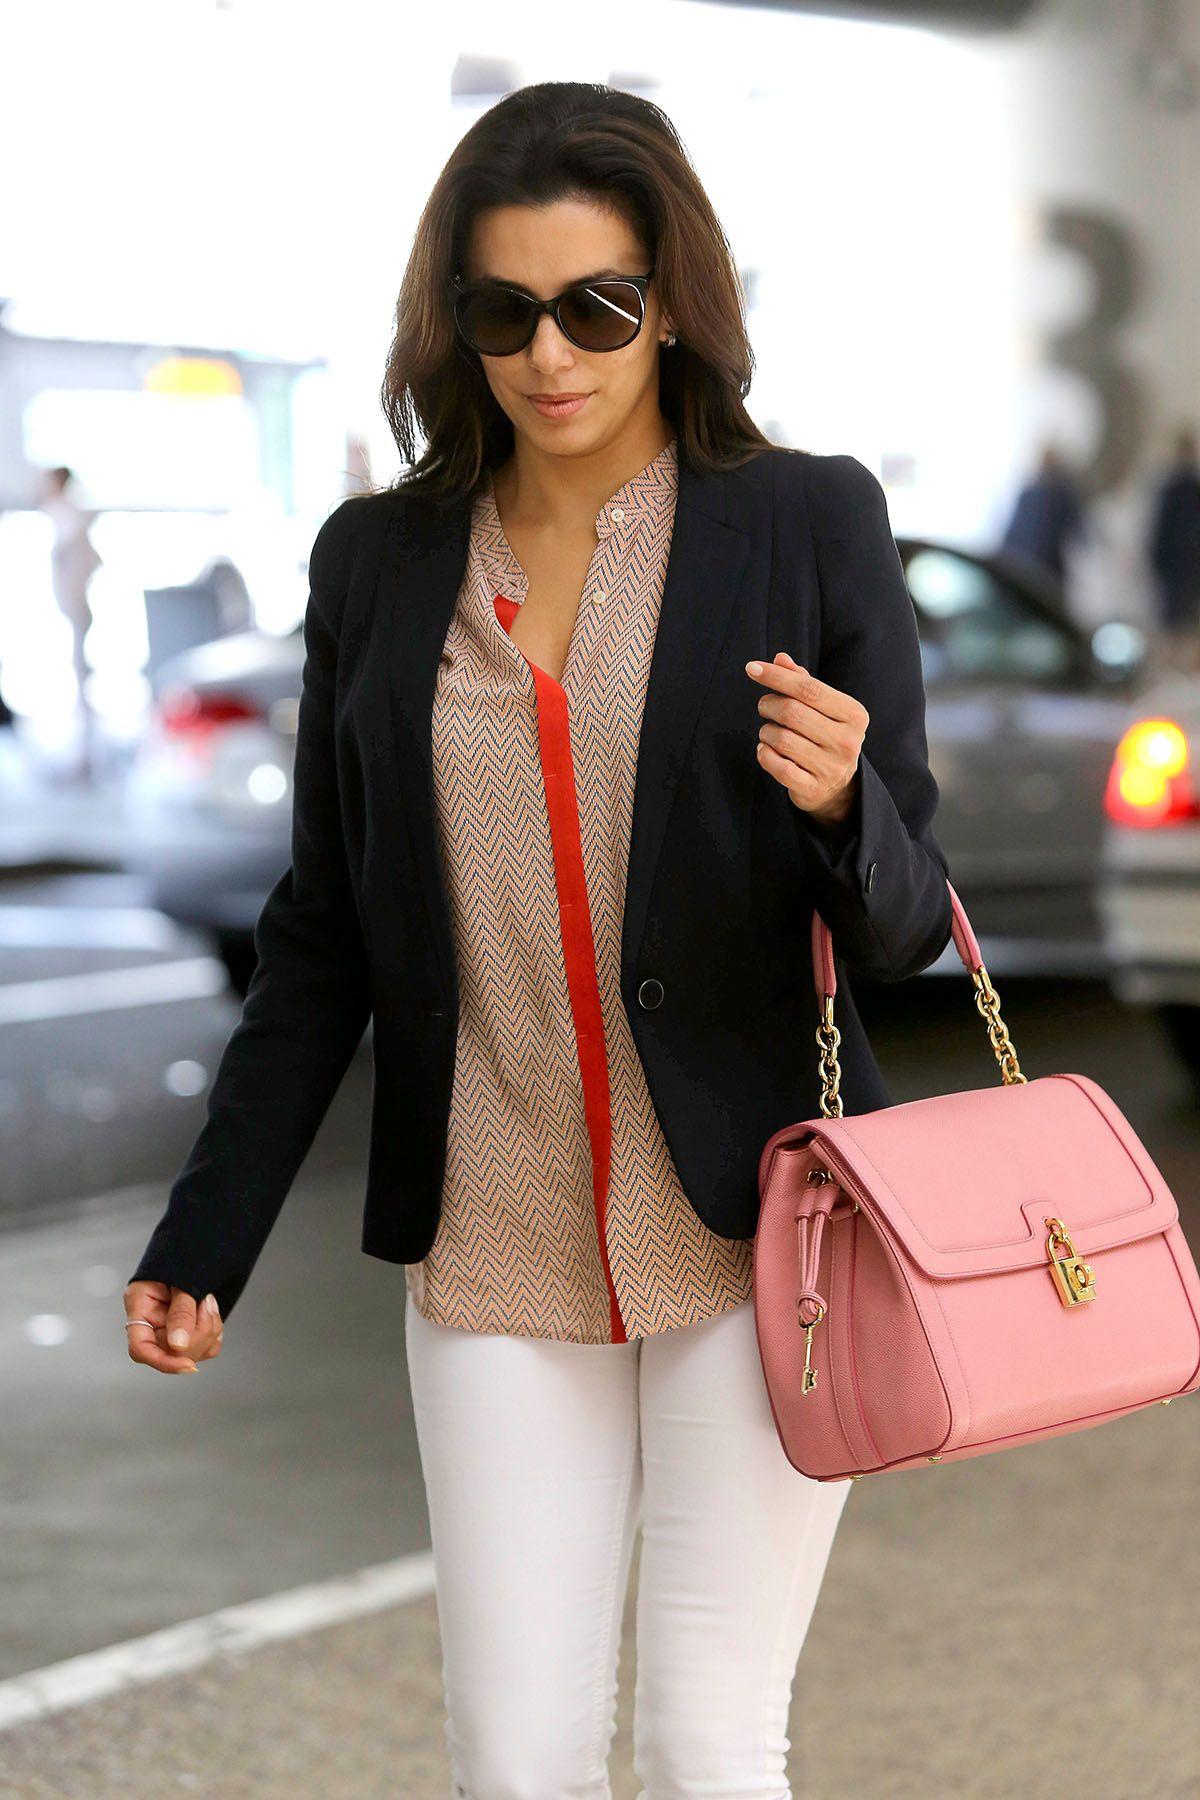 Style Watch Celebrity Streetstyle 19 Fab Fashion Fix